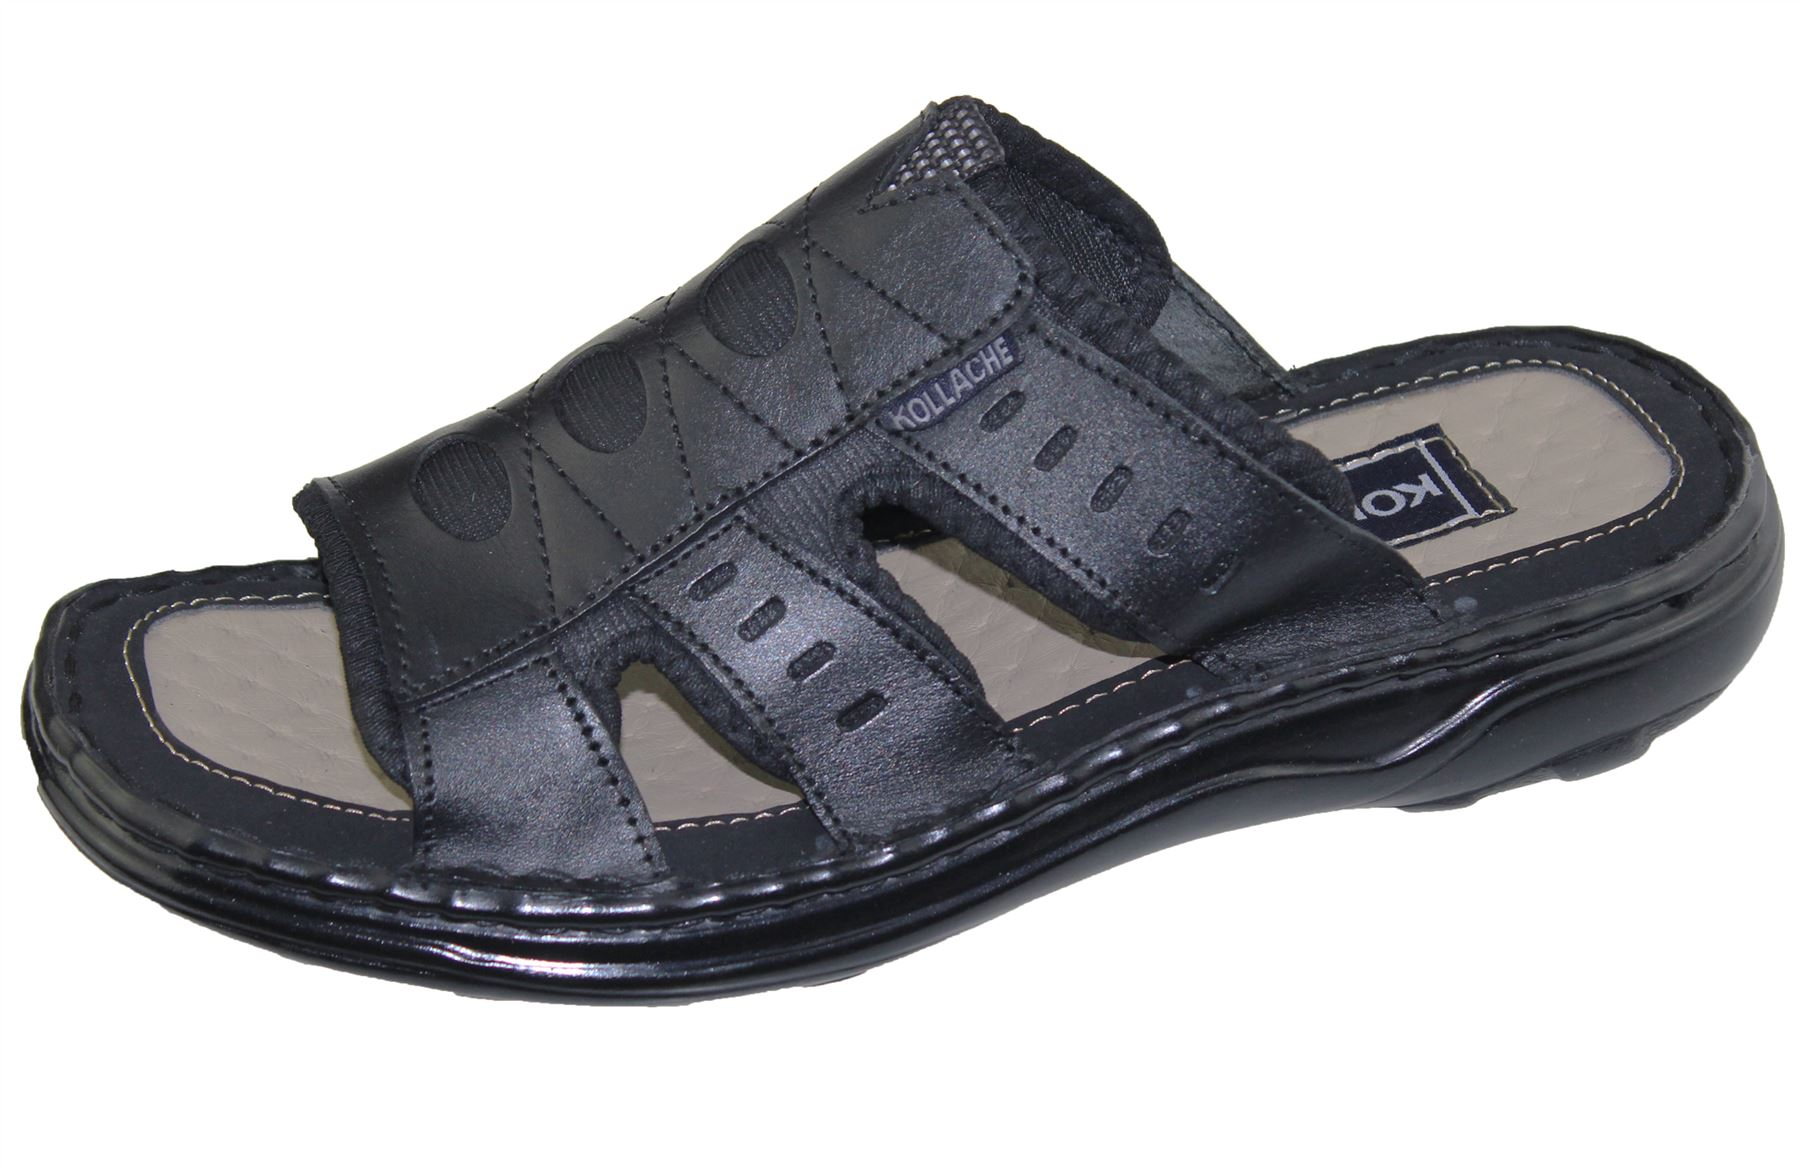 Mens-Slipper-Sandal-Sports-Beach-Buckle-Walking-Fashion-Summer-Casual-Shoes-Size miniatura 14